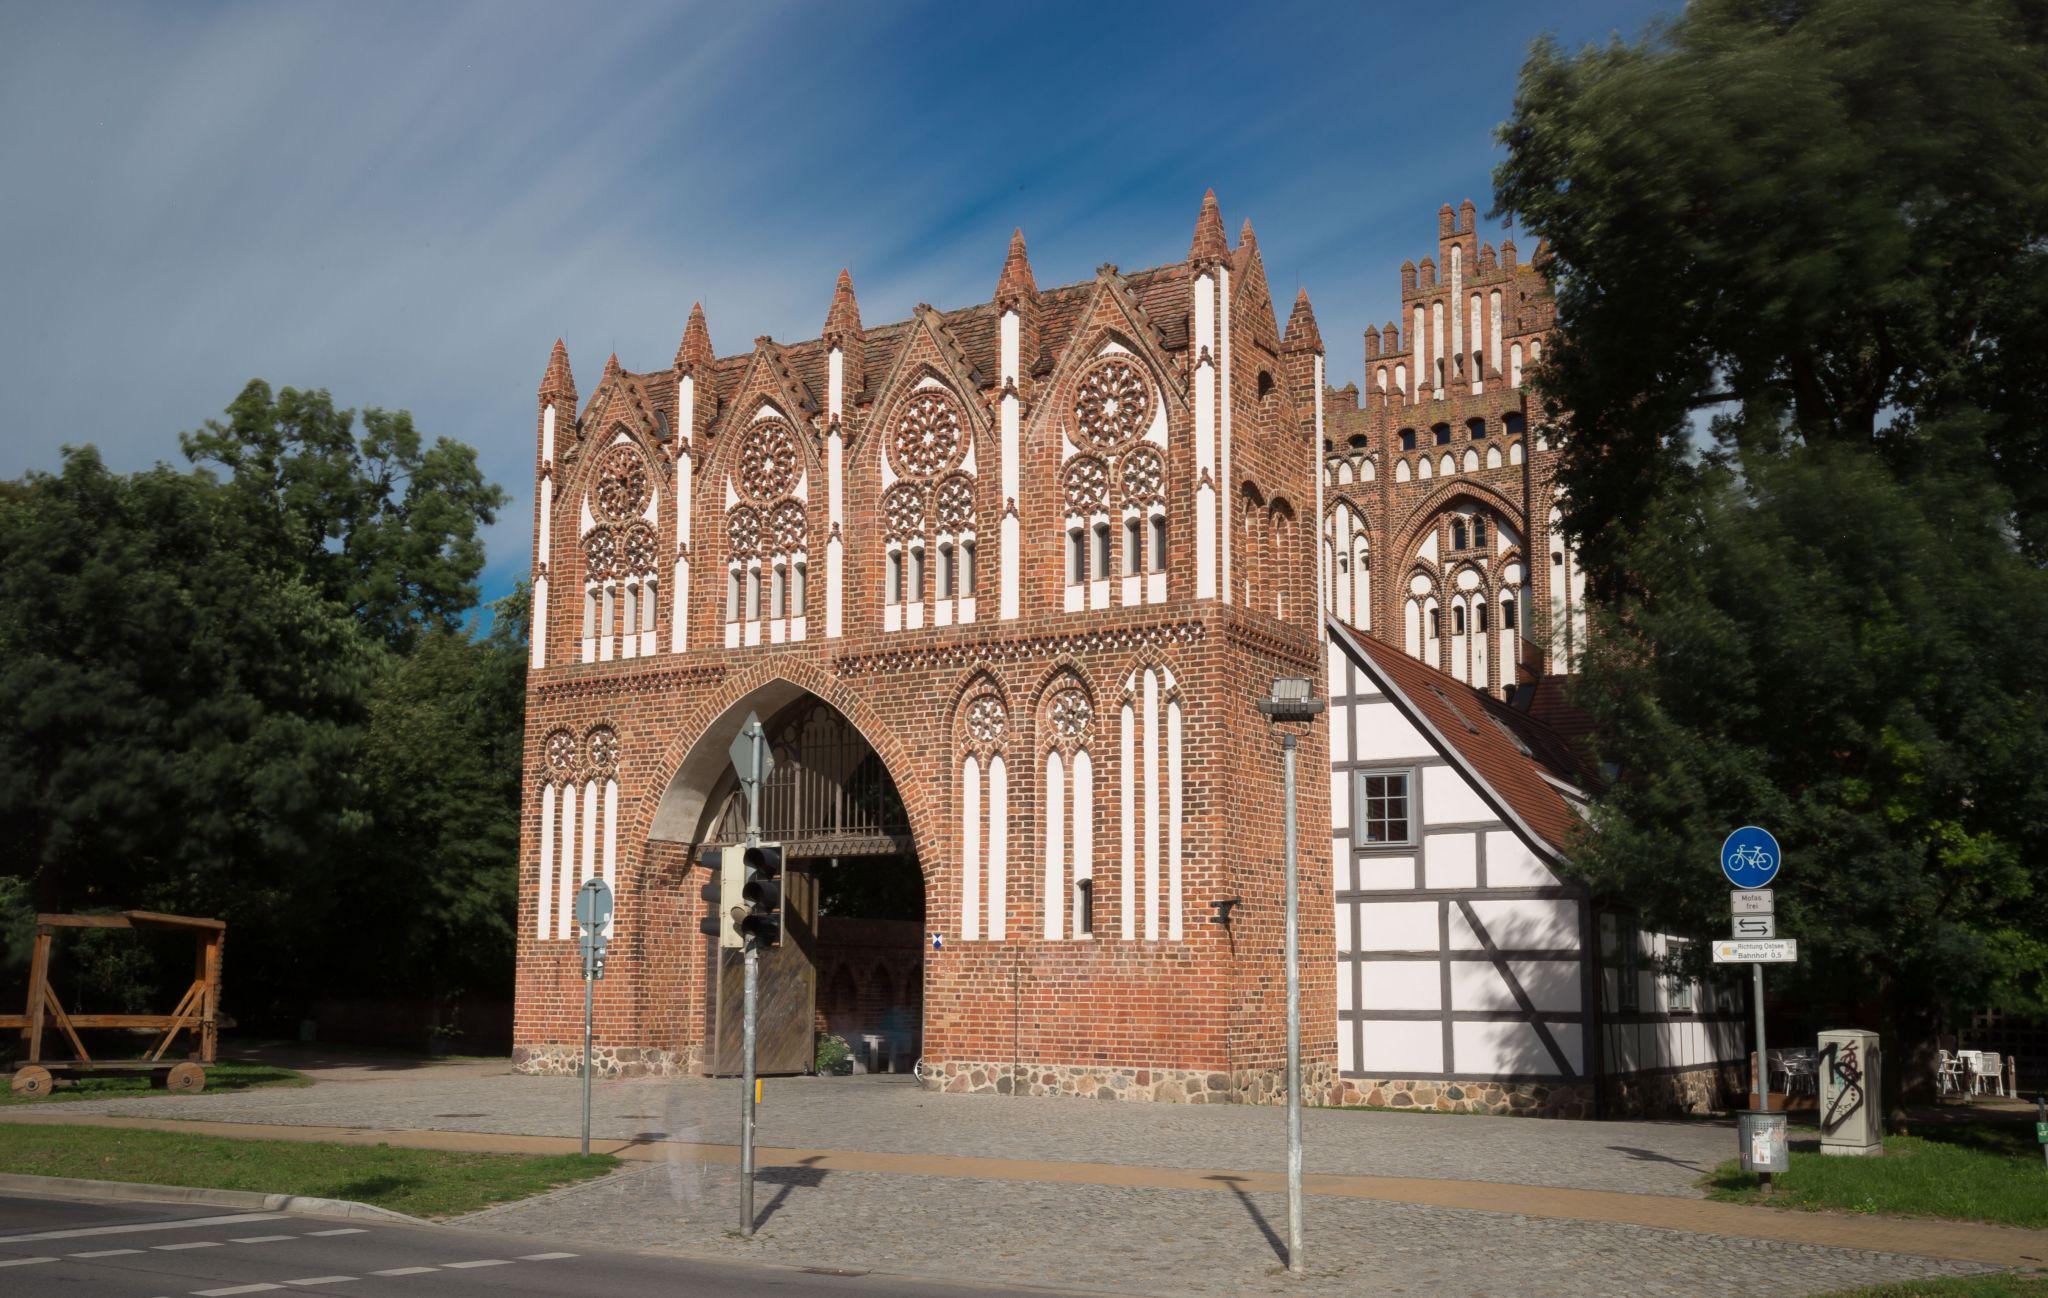 West side of the Treptower Gate, Neubrandenburg, Germany